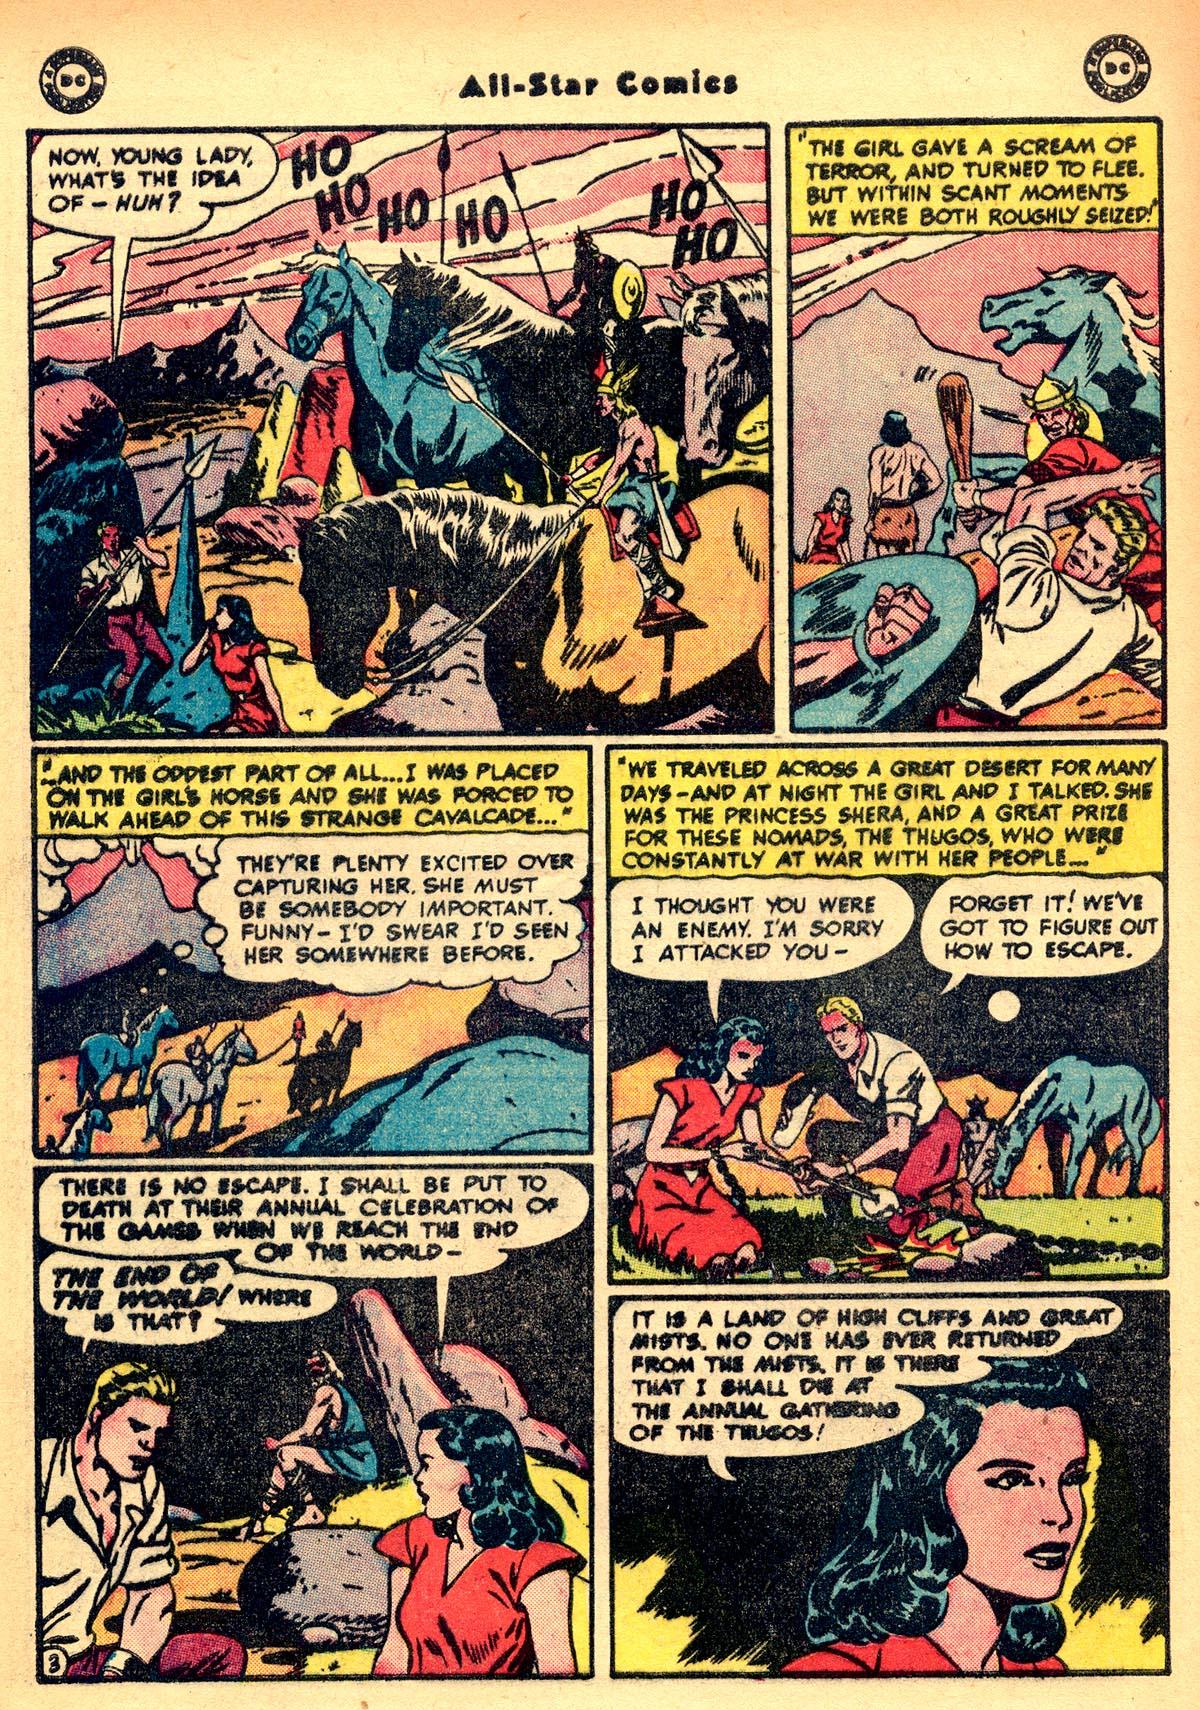 Read online All-Star Comics comic -  Issue #48 - 46